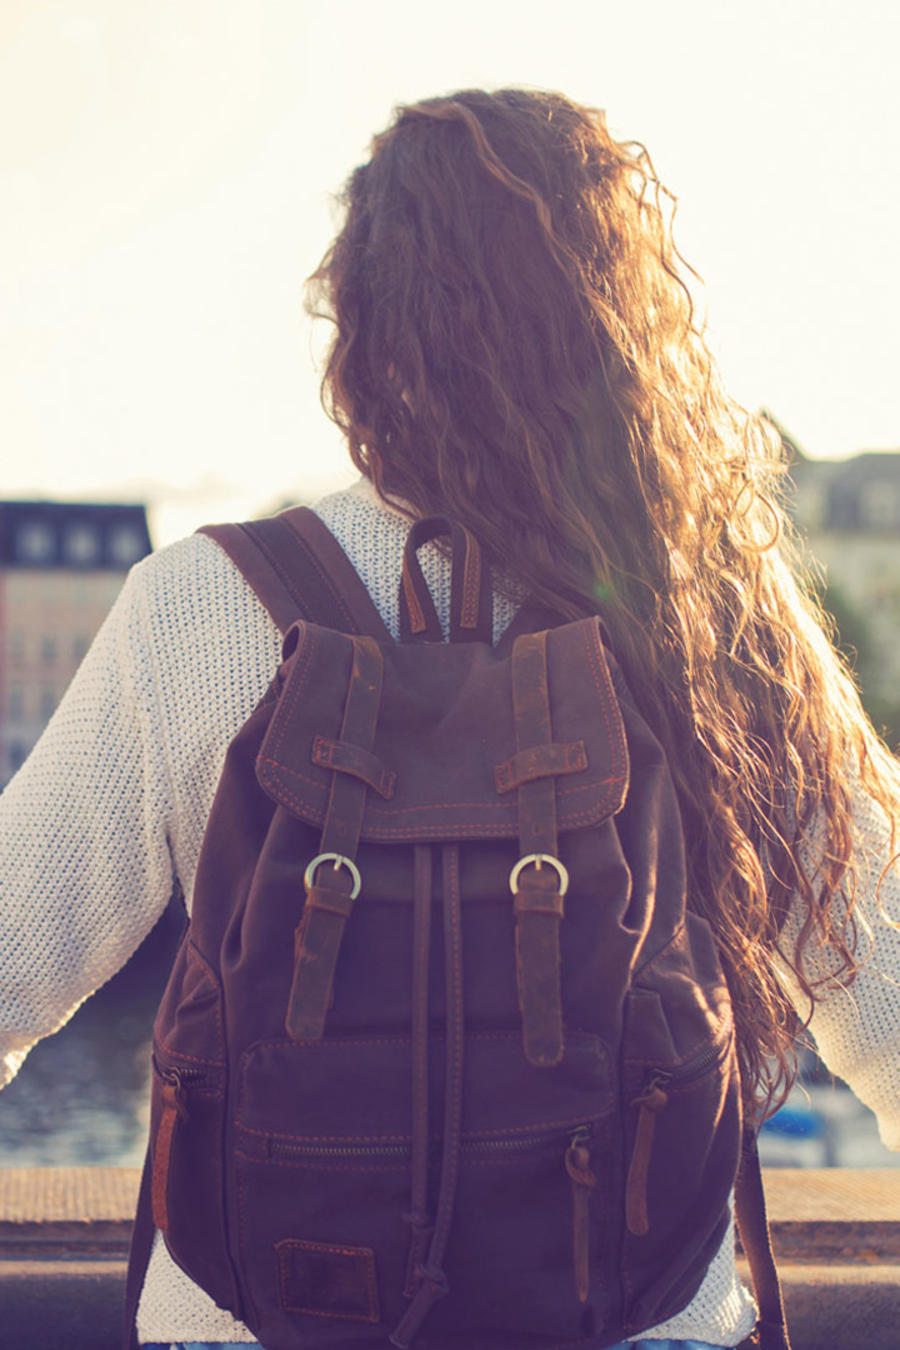 Joven de cabello largo con mochila, en Copenhagen